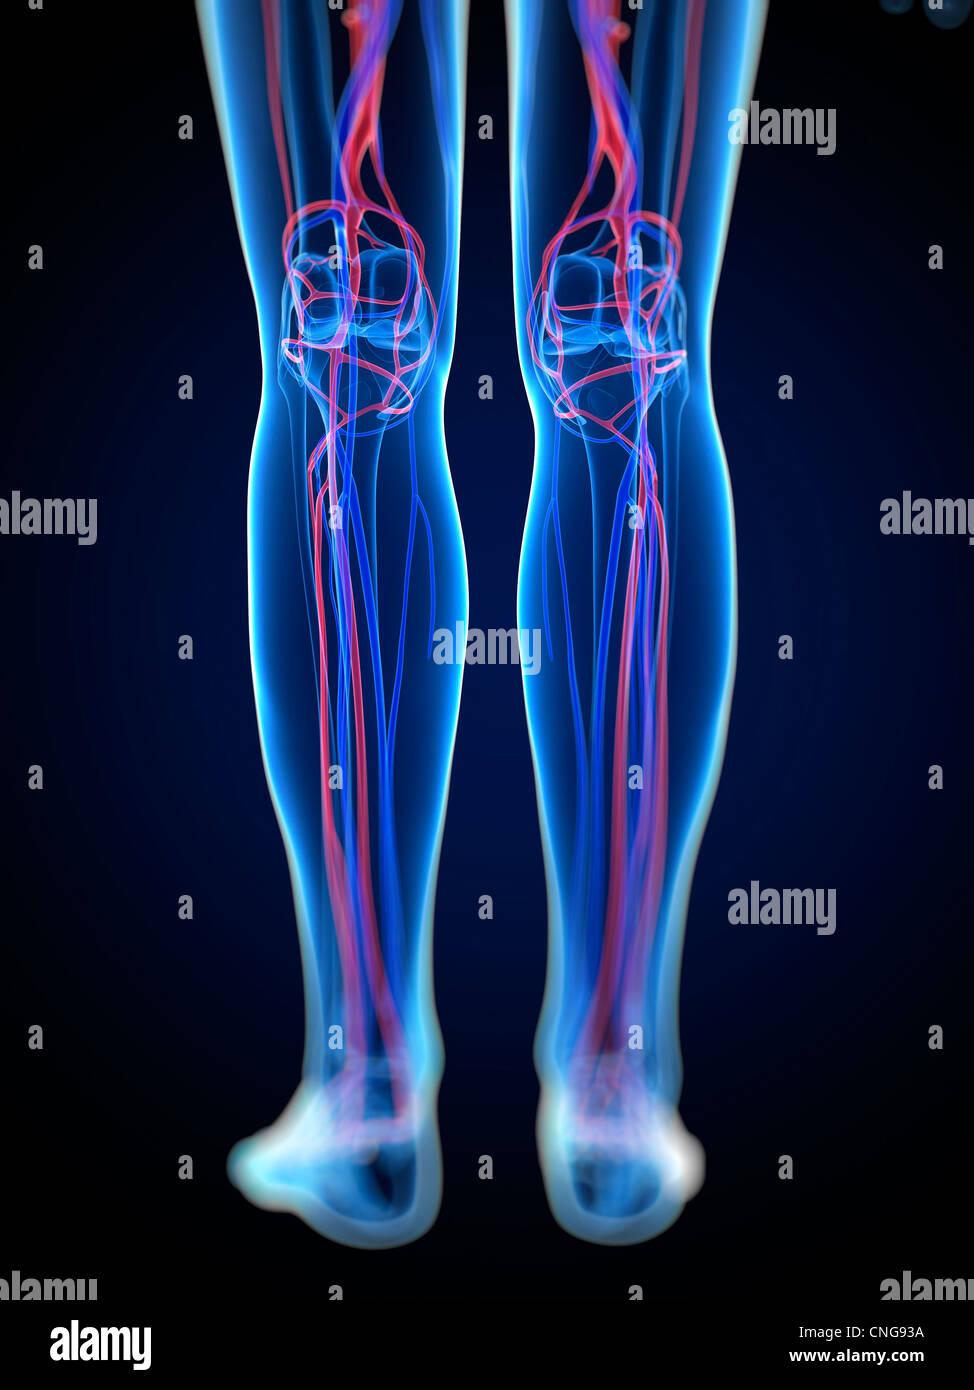 Artery Legs Stock Photos Artery Legs Stock Images Alamy